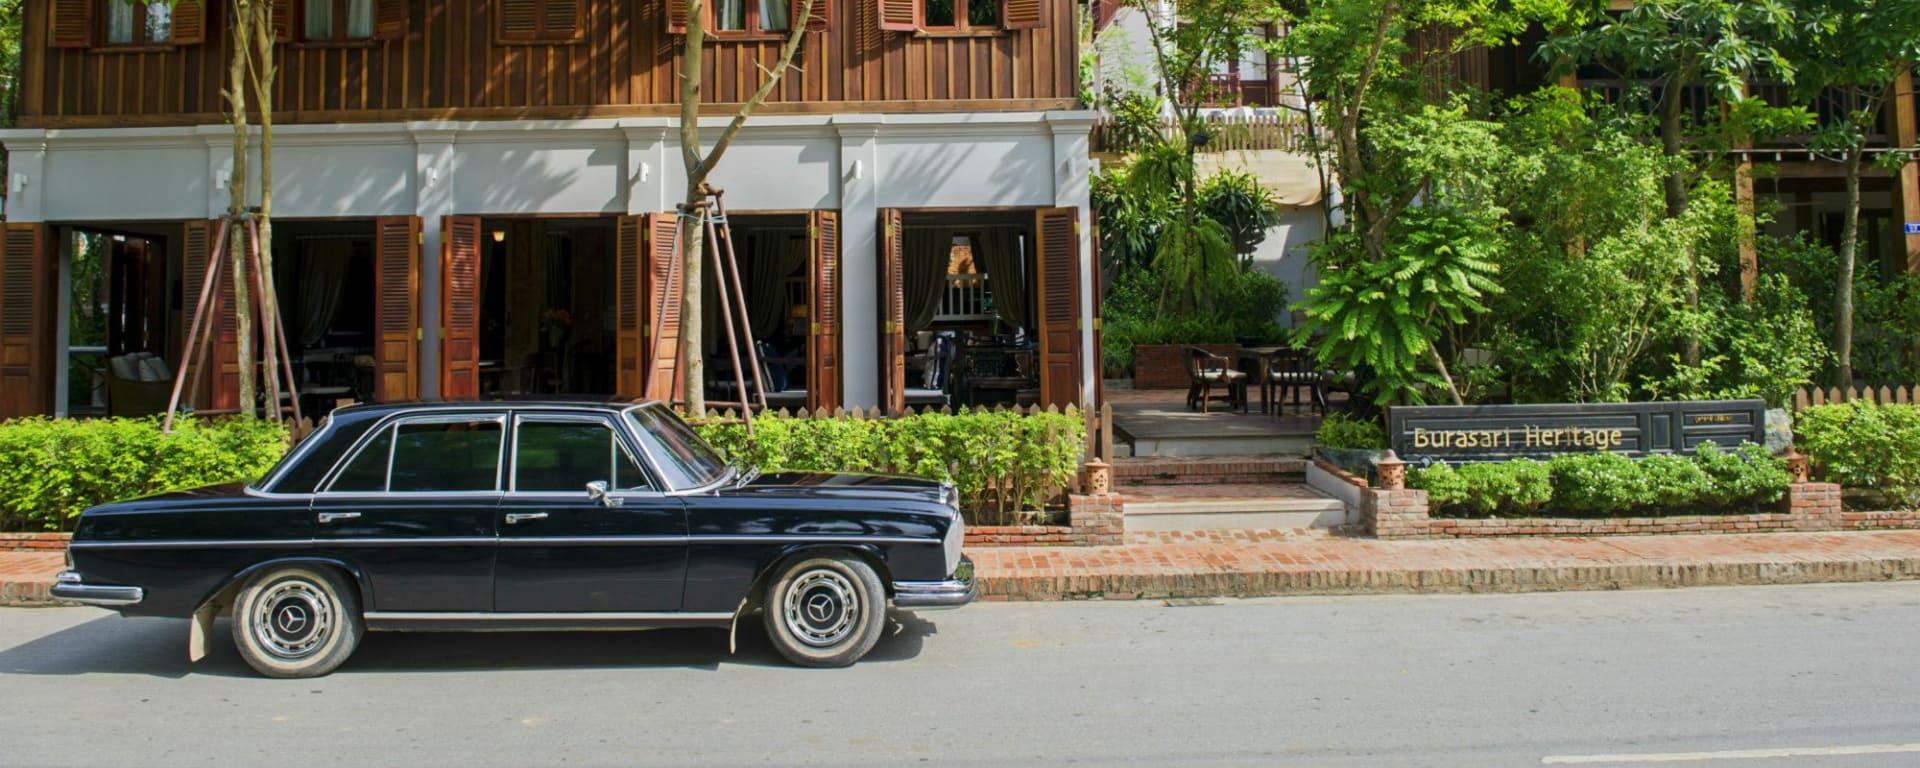 Burasari Heritage in Luang Prabang: Exterior